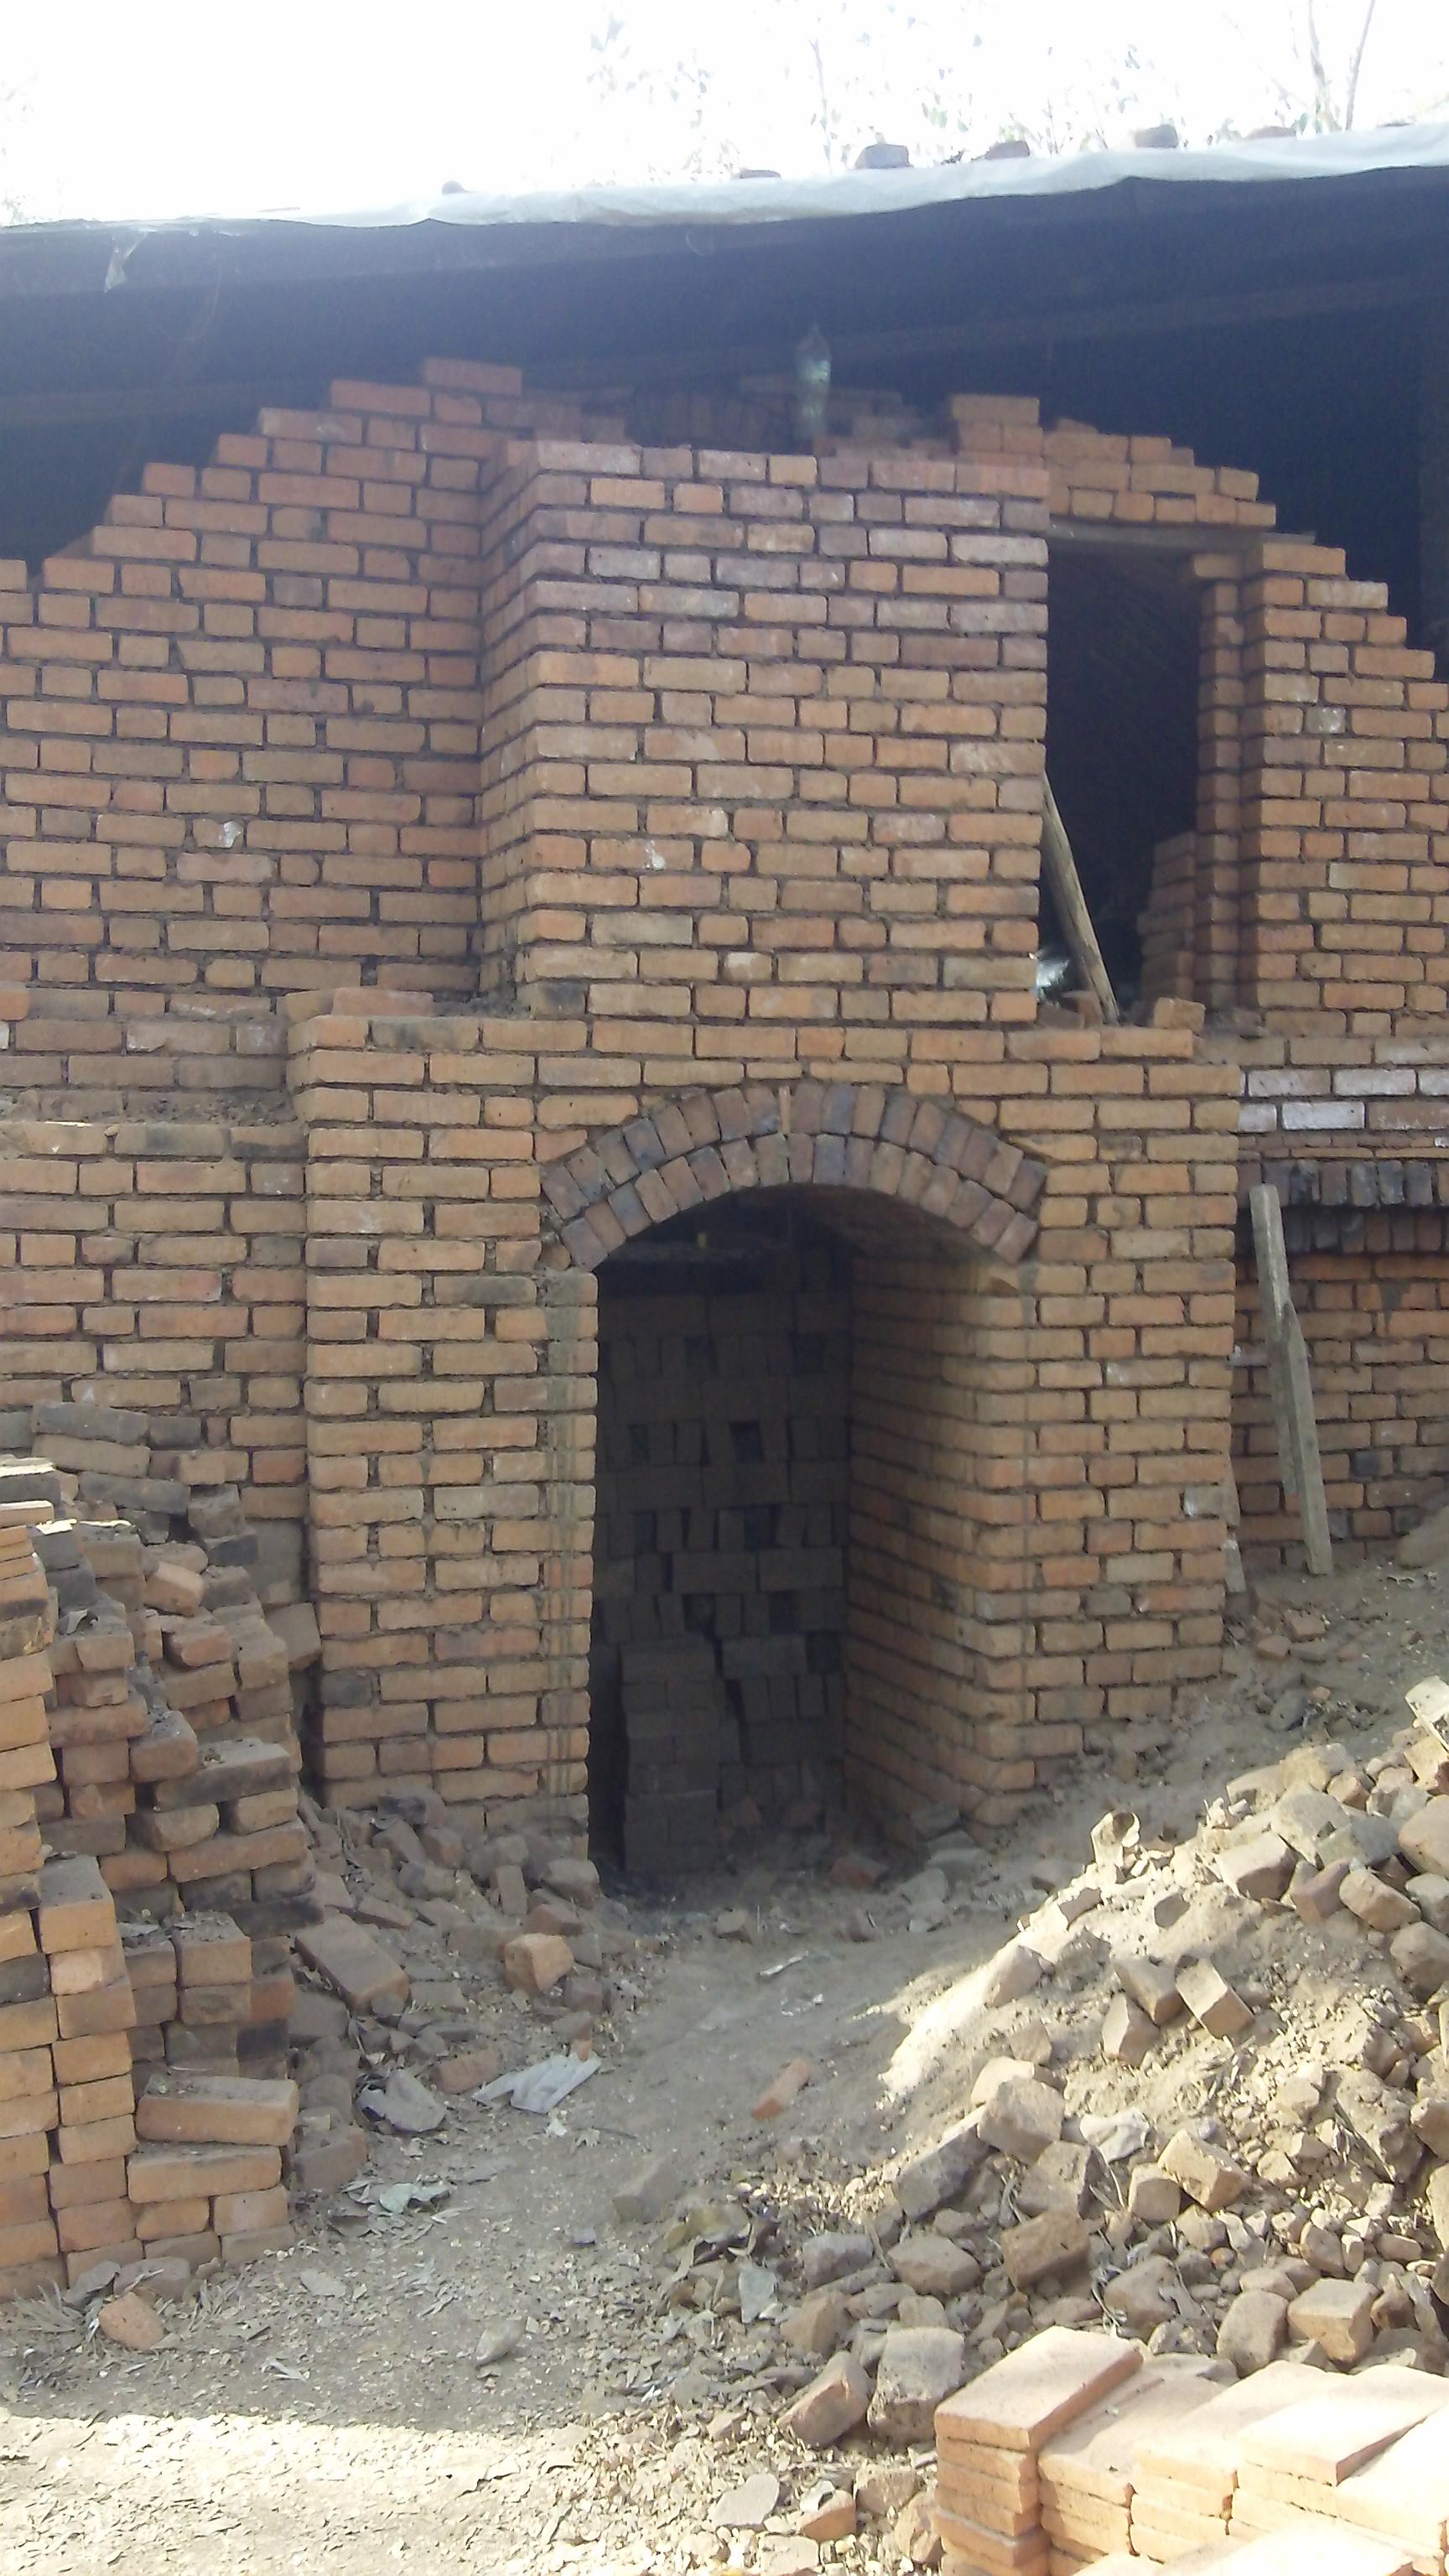 Clamp kiln vault and chimney-303_0536.jpg